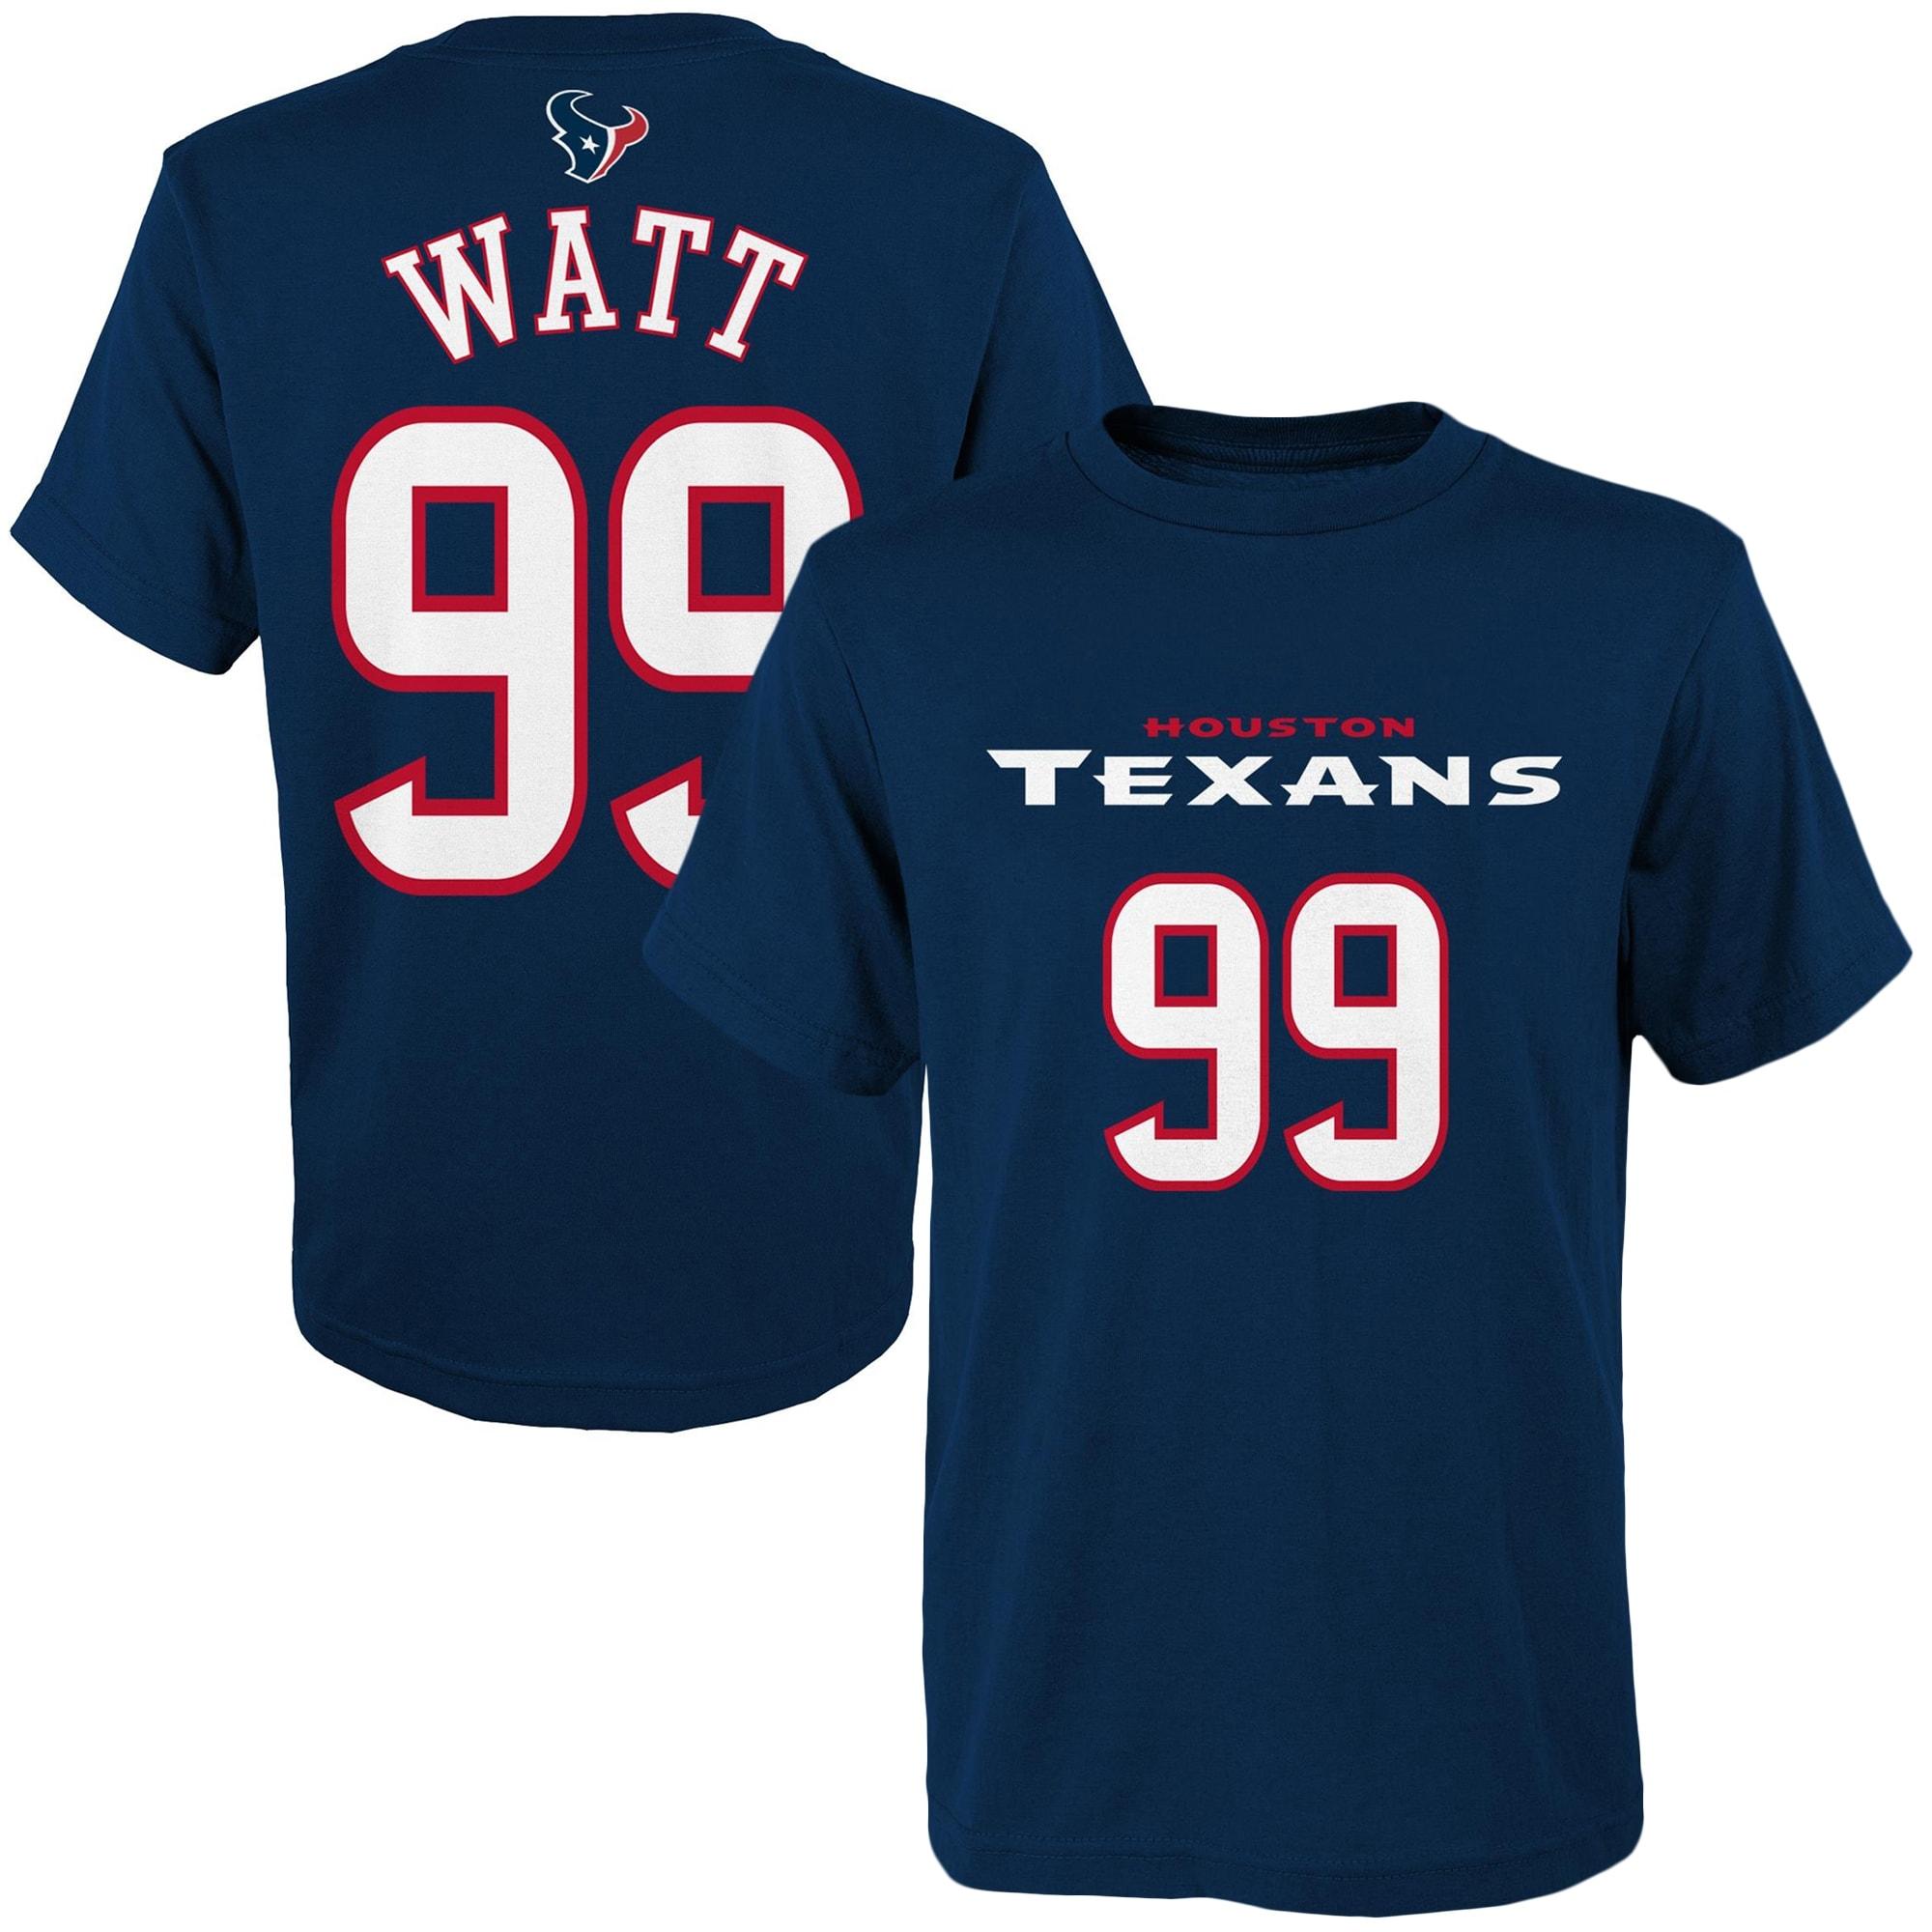 J.J. Watt Houston Texans Youth Mainliner Player Name & Number T-Shirt - Navy